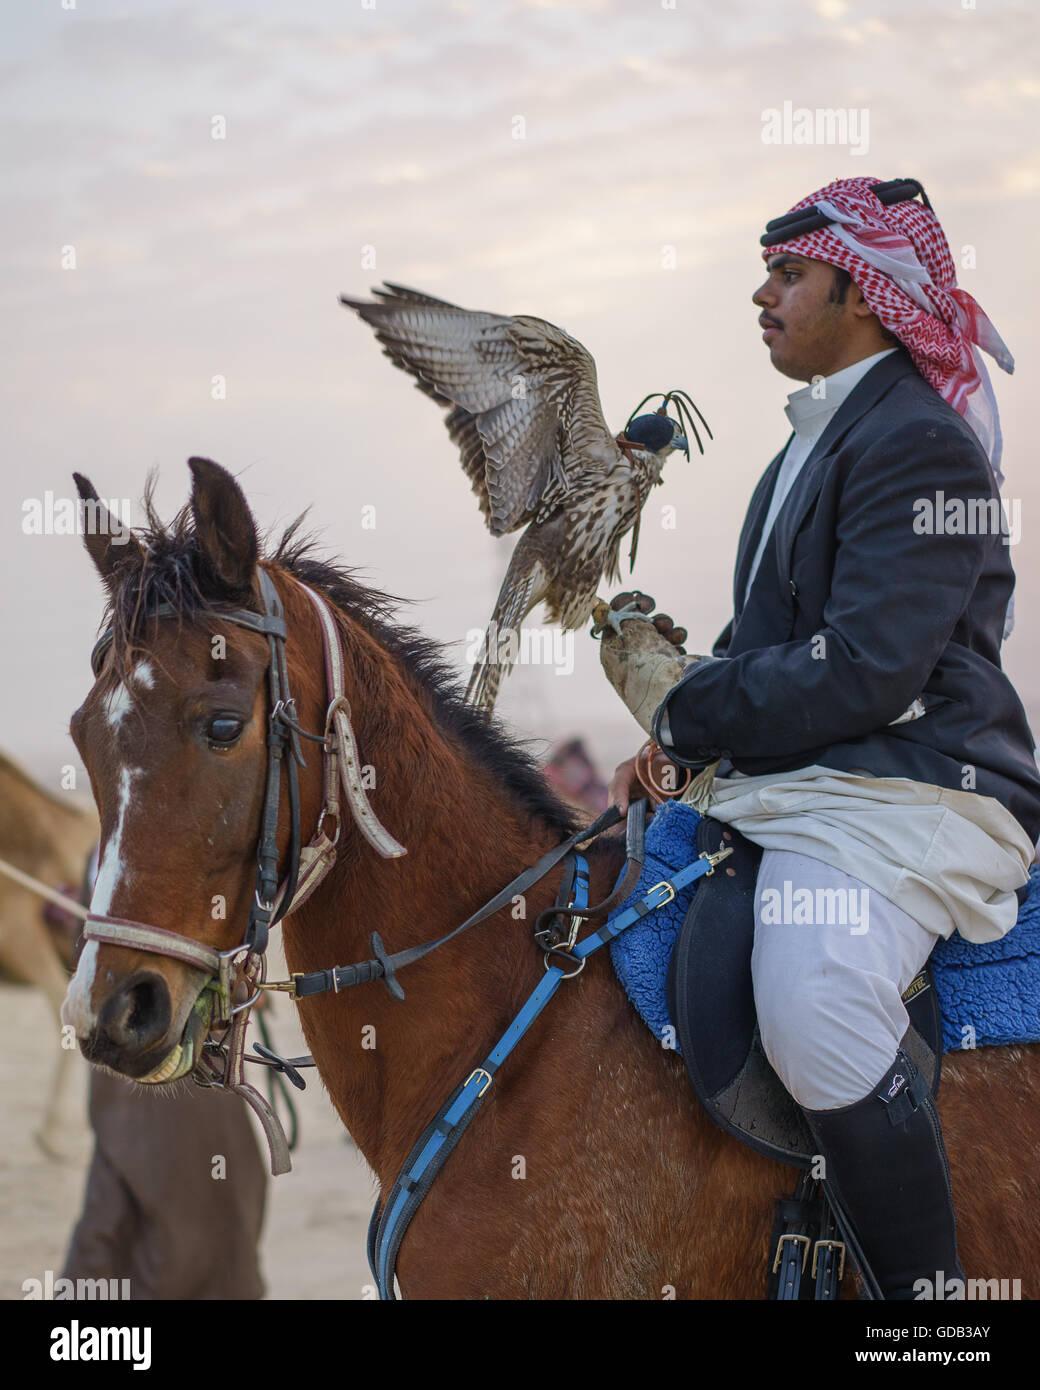 Hunter à cheval avec son falcon, au Qatar. Photo Stock